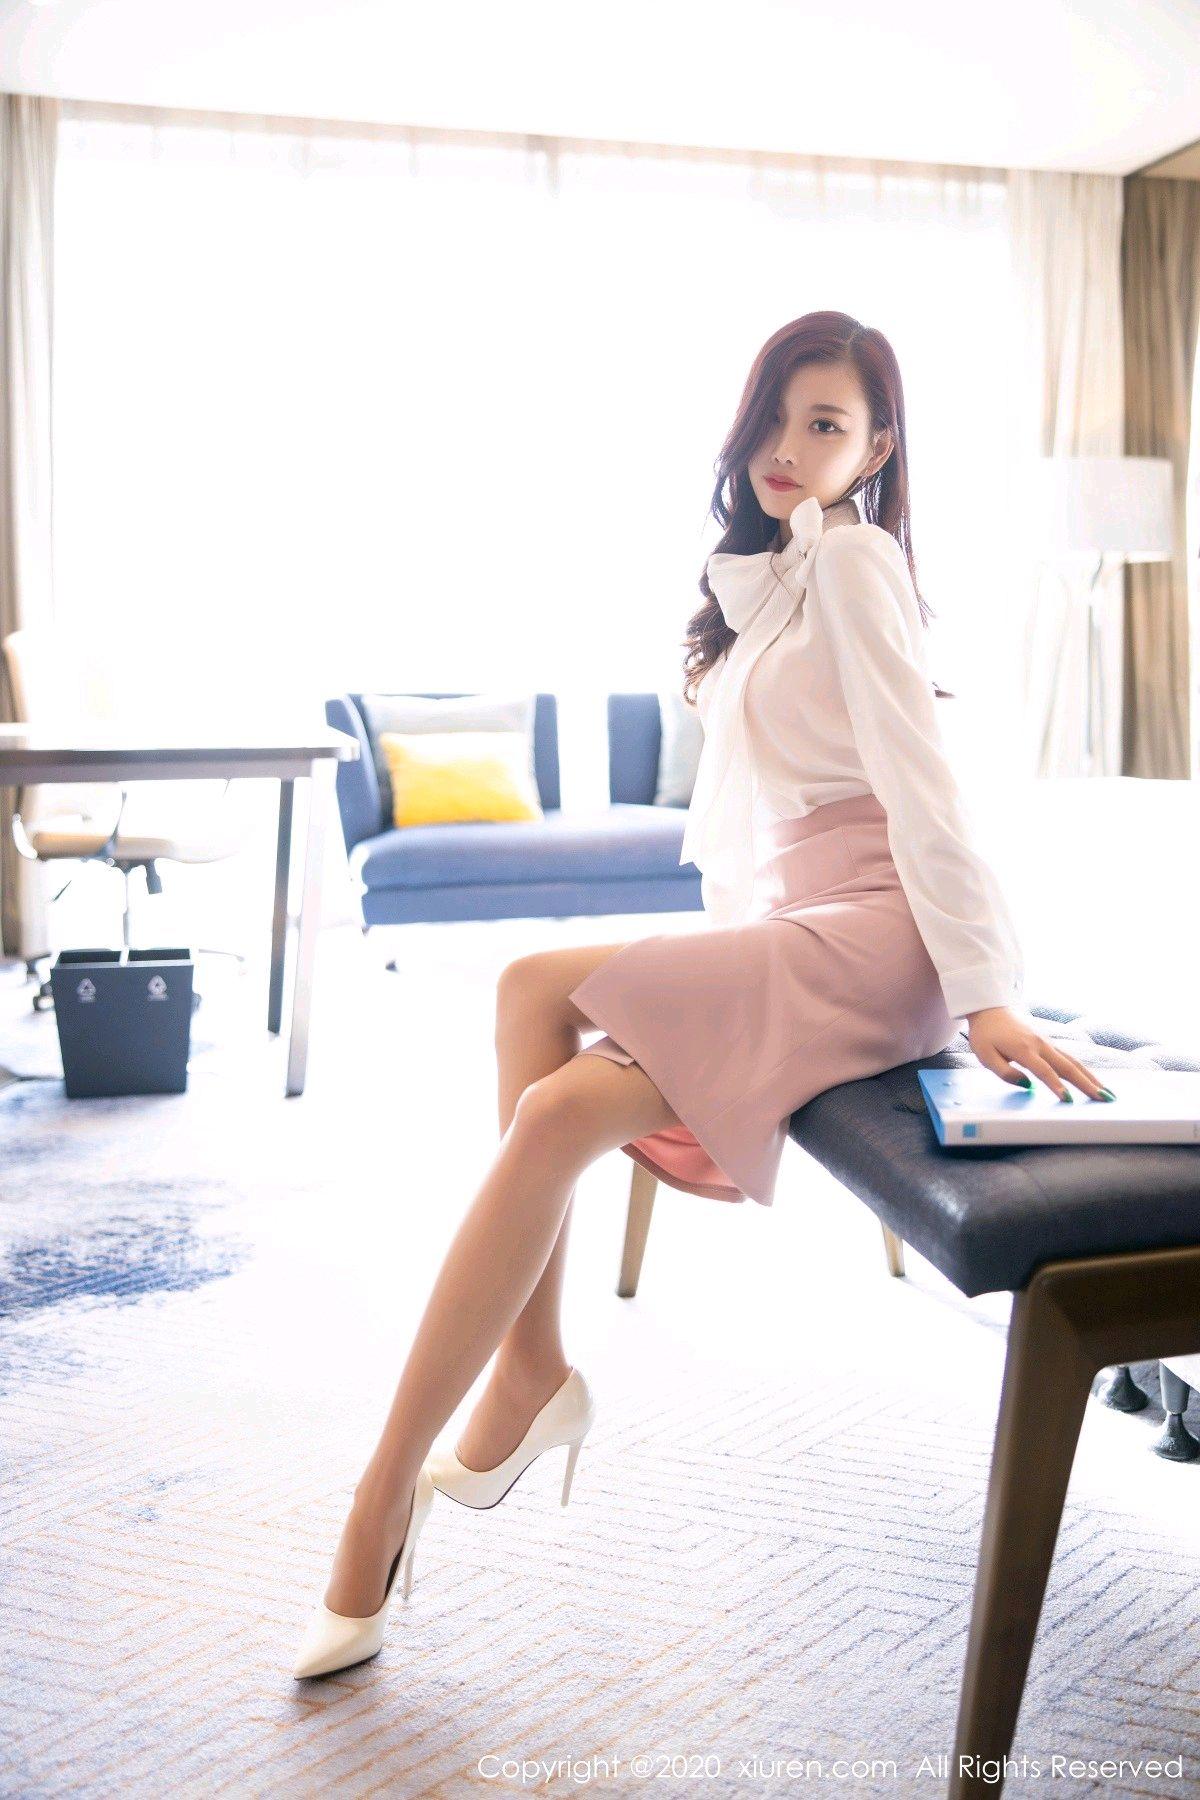 [XiuRen] Vol.2431 Yang Chen Chen 6P, Tall, Underwear, Uniform, Xiuren, Yang Chen Chen